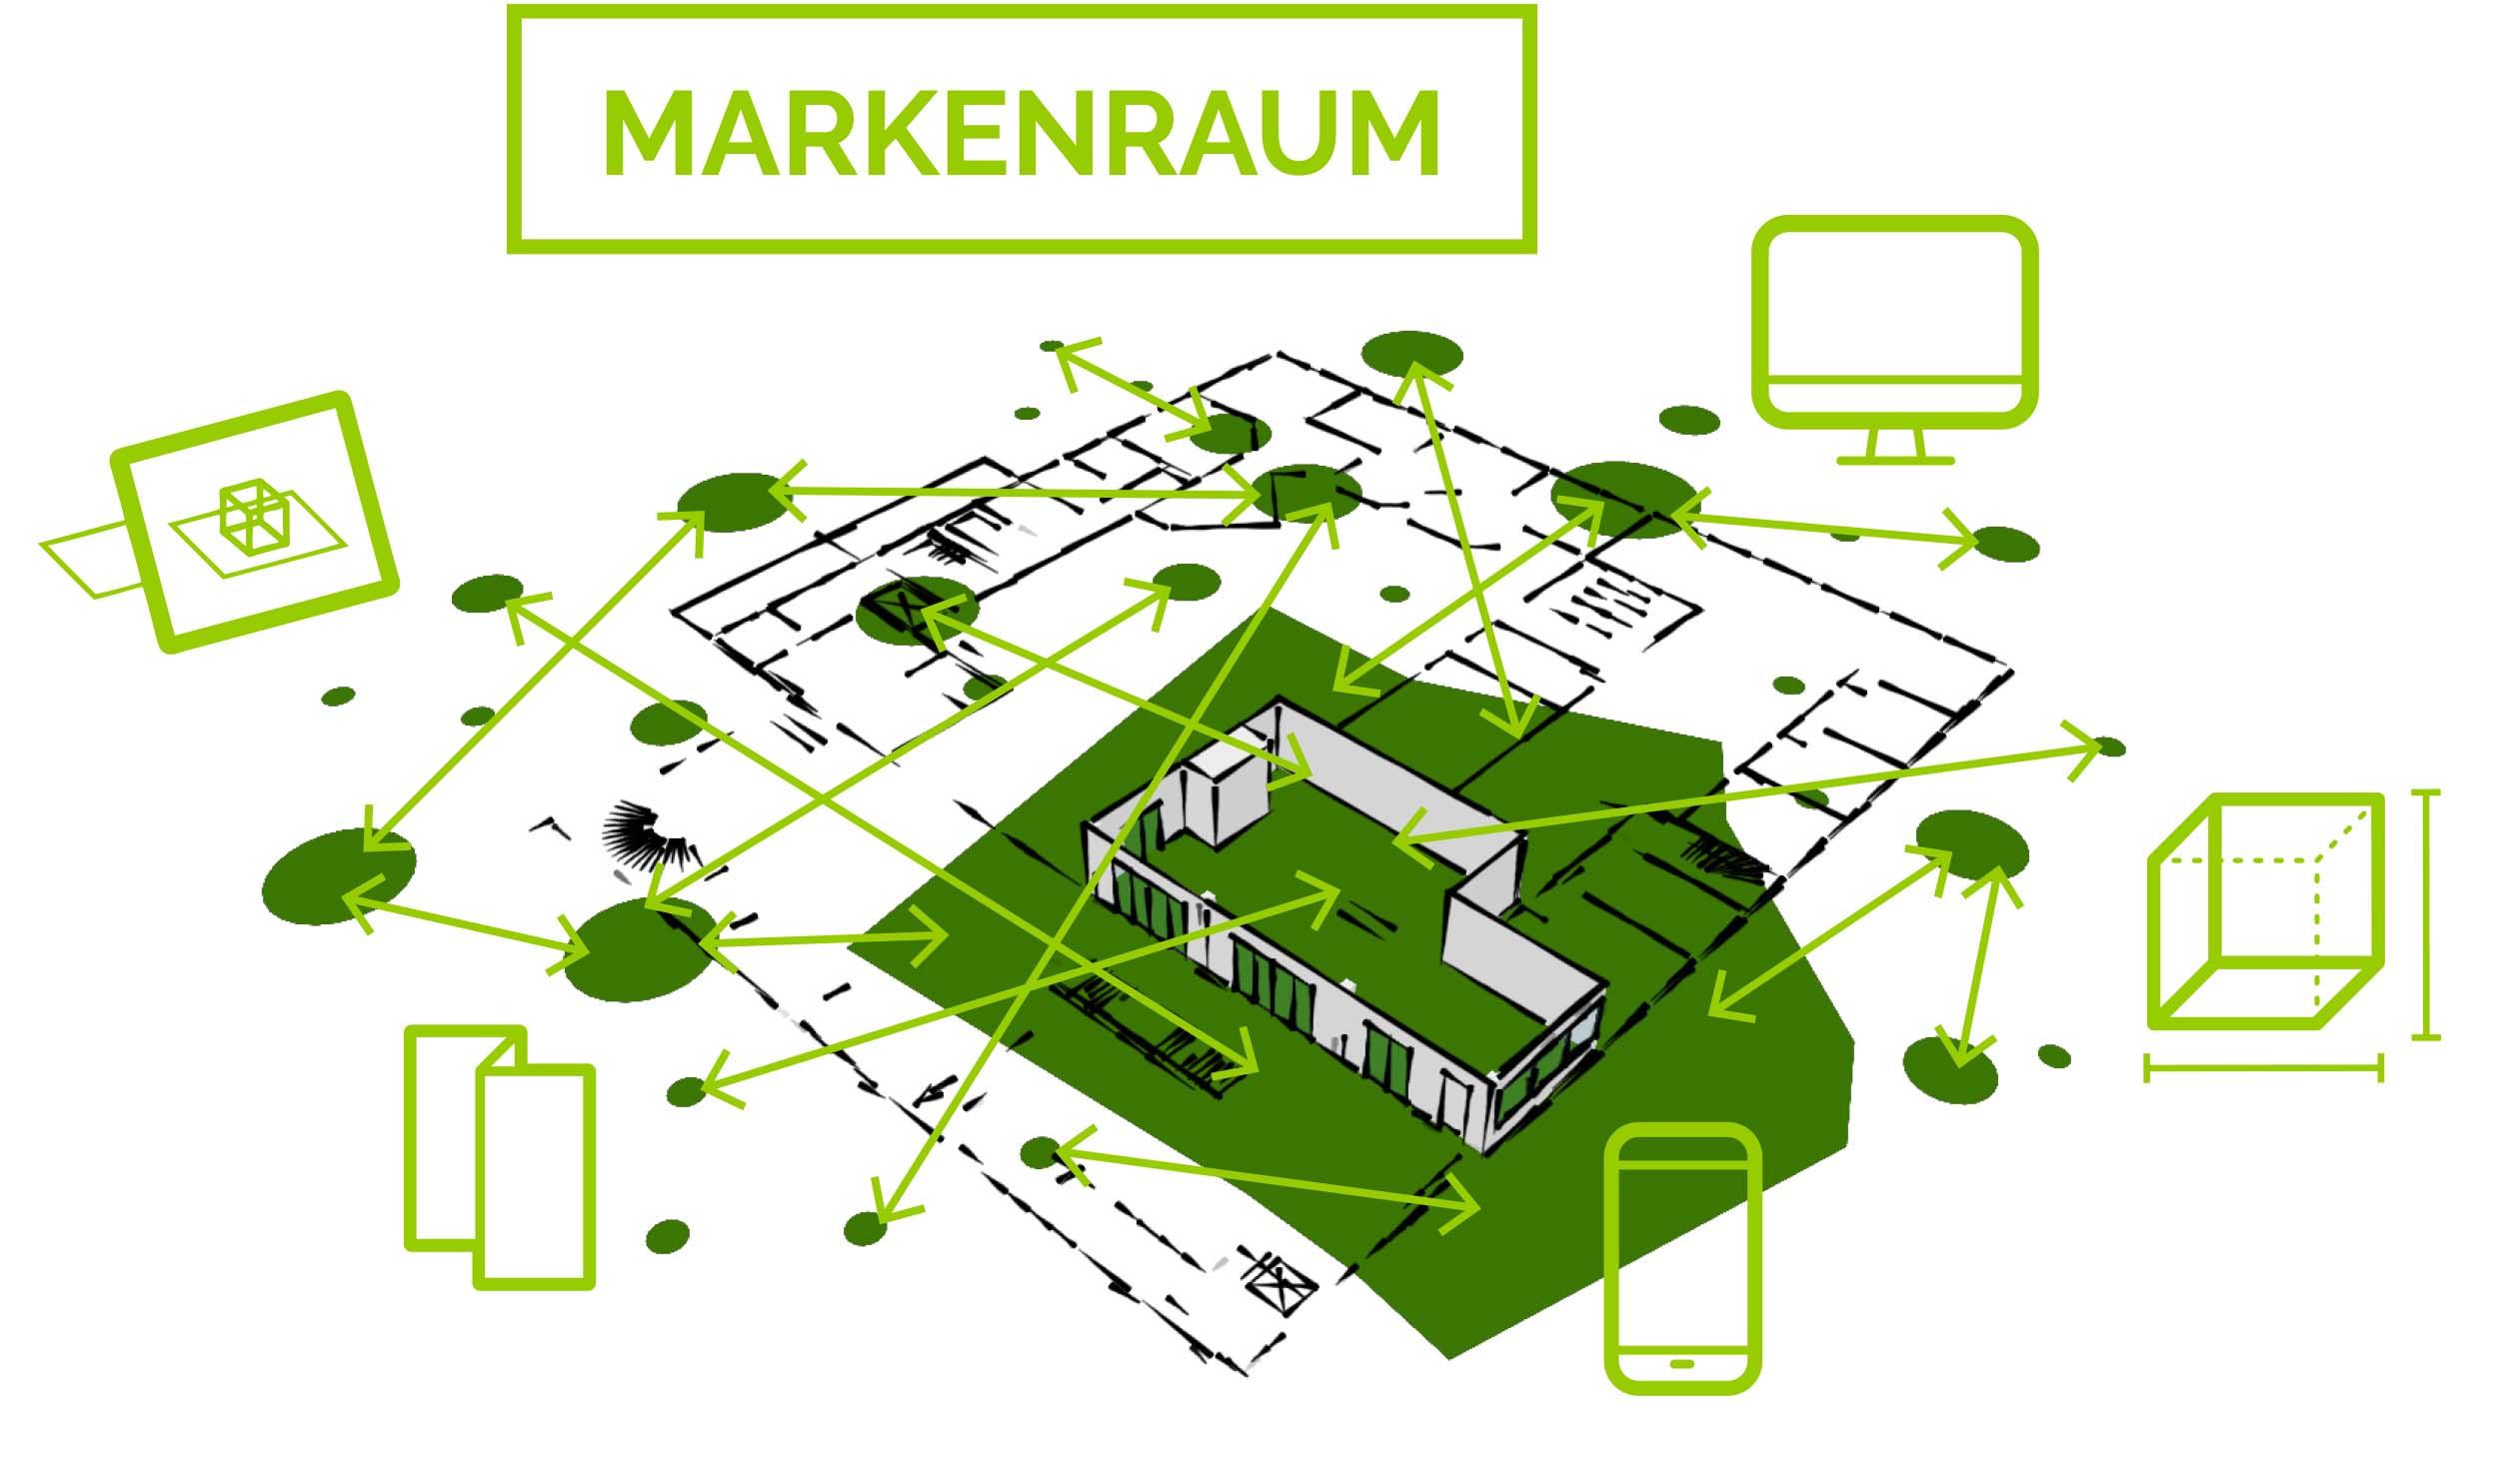 Markenraum_05-03